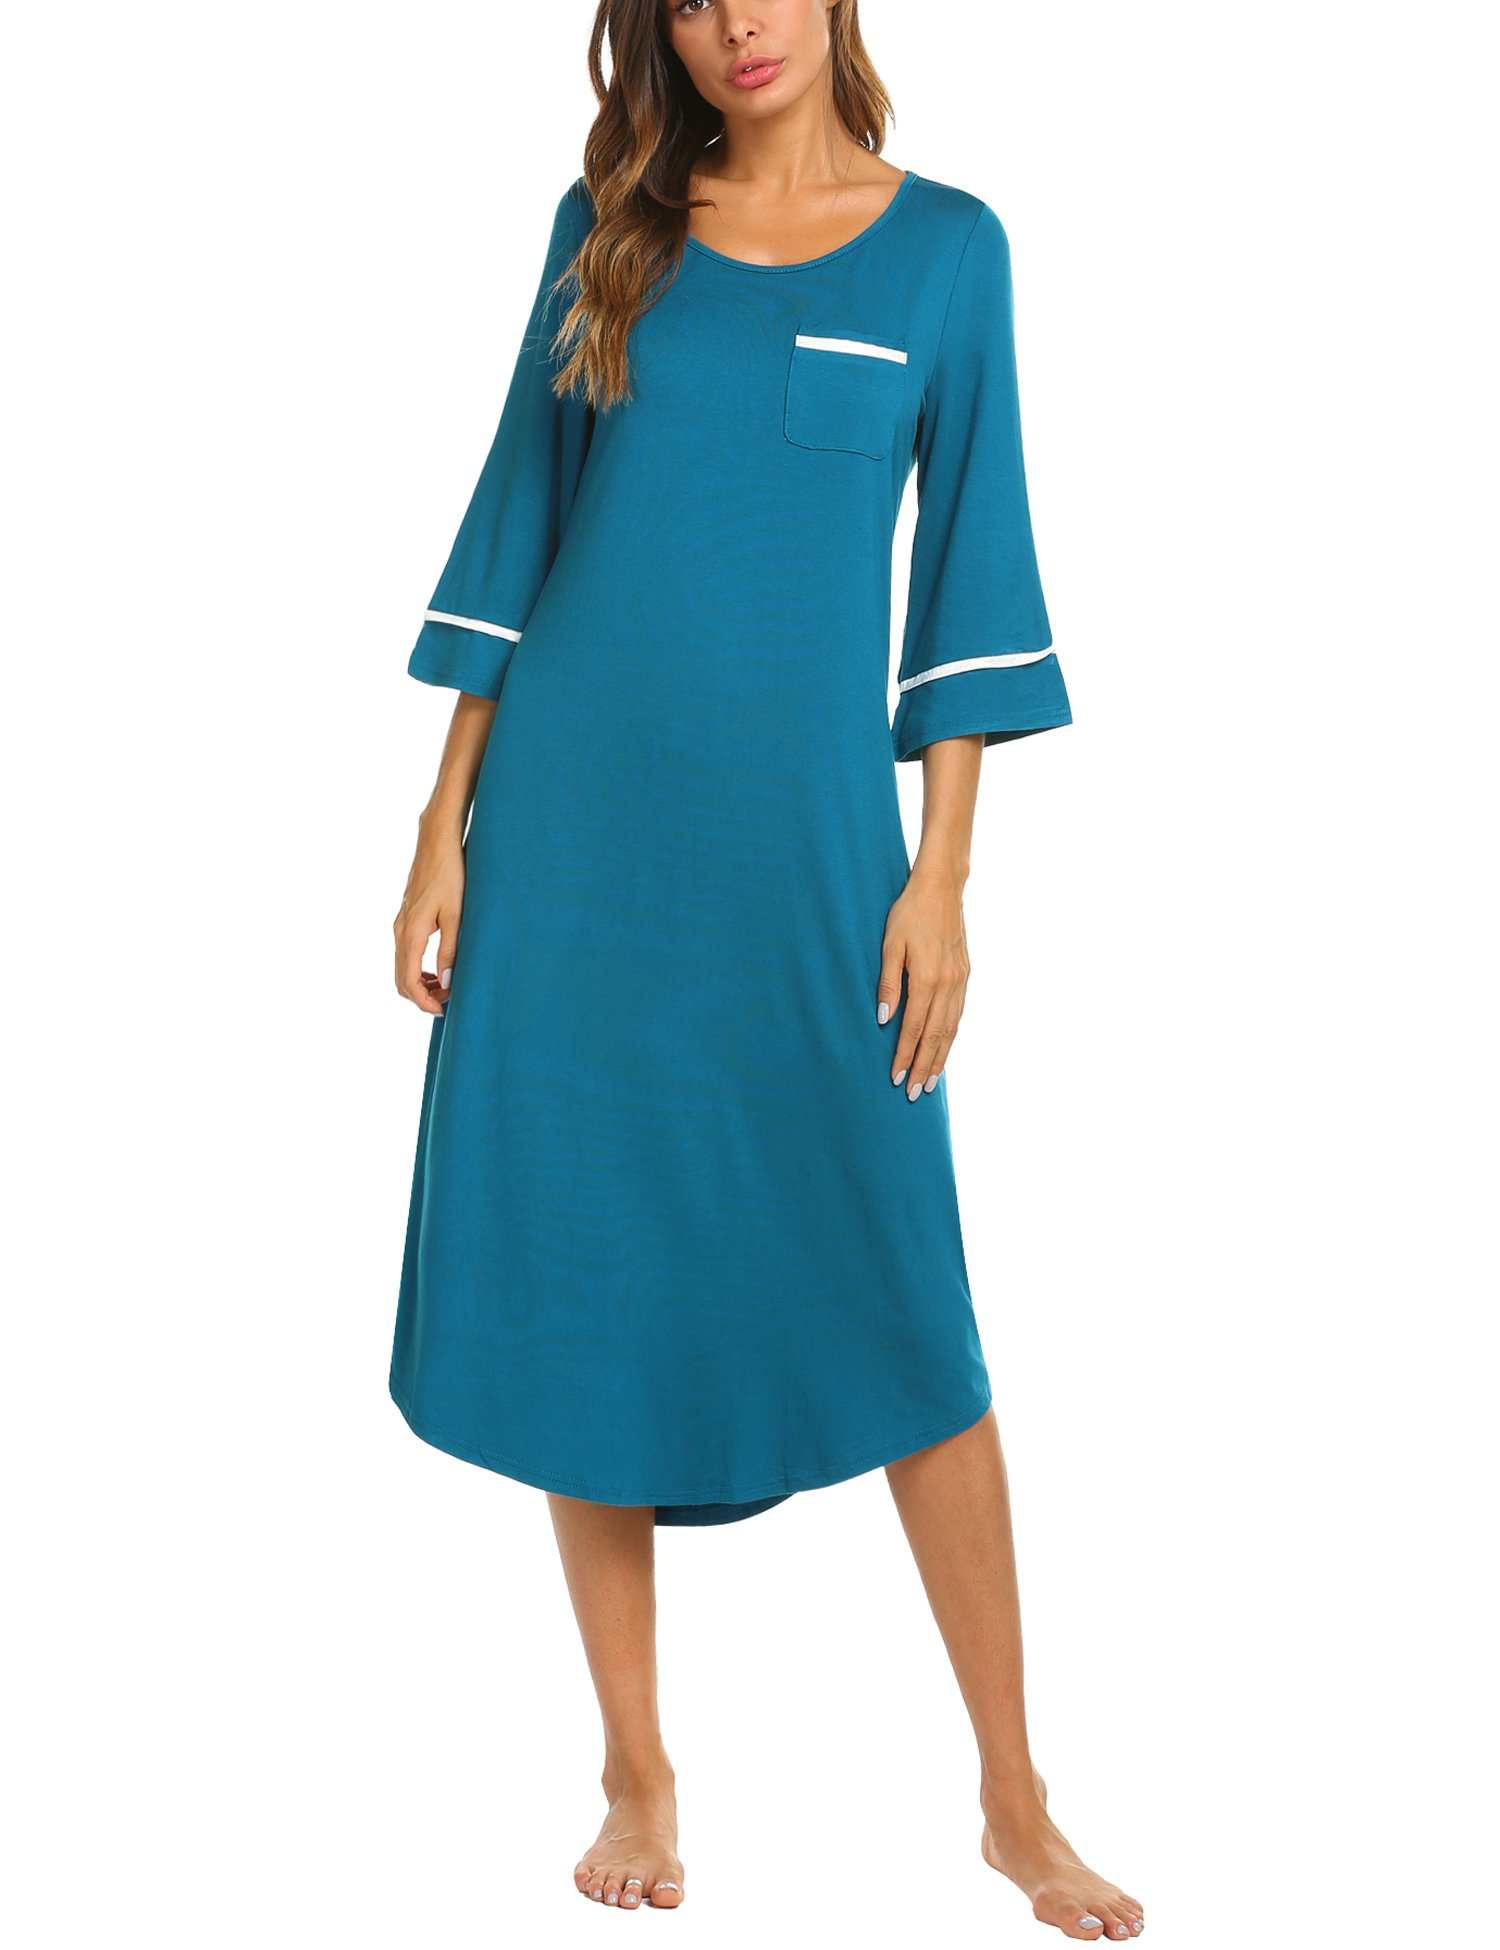 1659d0701ab Ekouaer Nightgown Womens Sleepwear Half Sleeve Nightshirt Soft Long Sleep  Dress